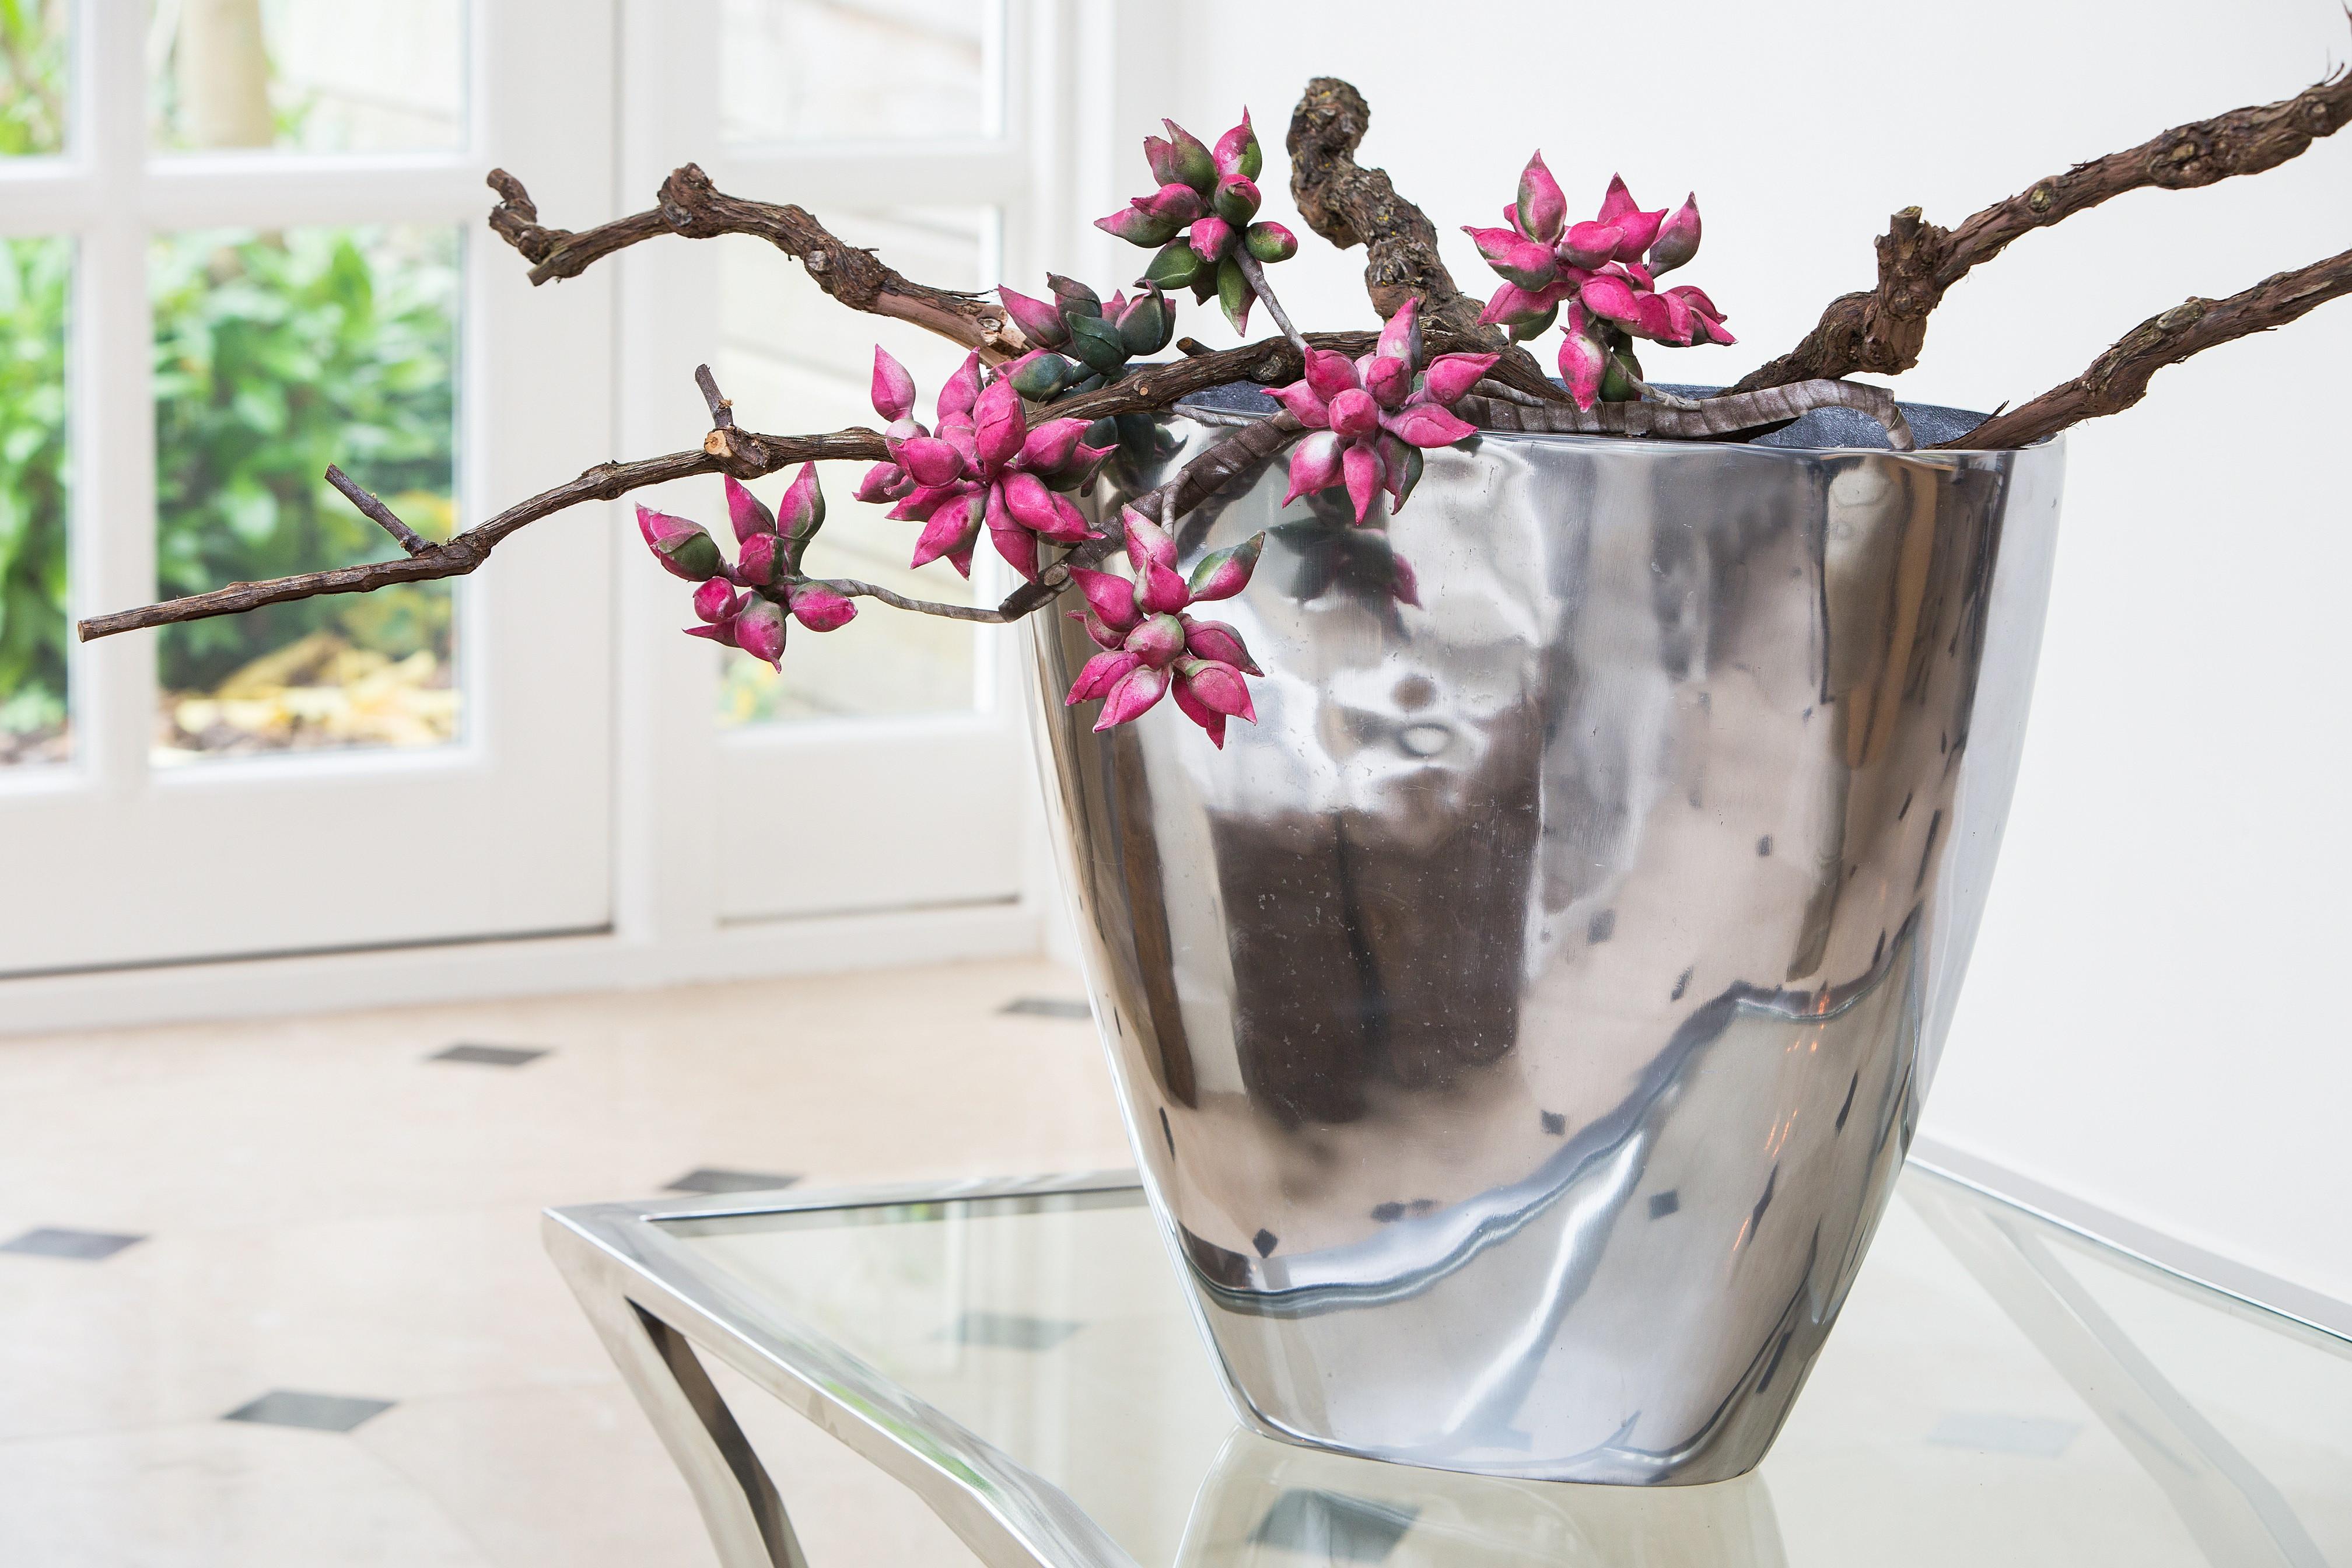 mausoleum vase holders of b2b webshop inspiring decorative lighting home accessories regarding flm 2015 000874